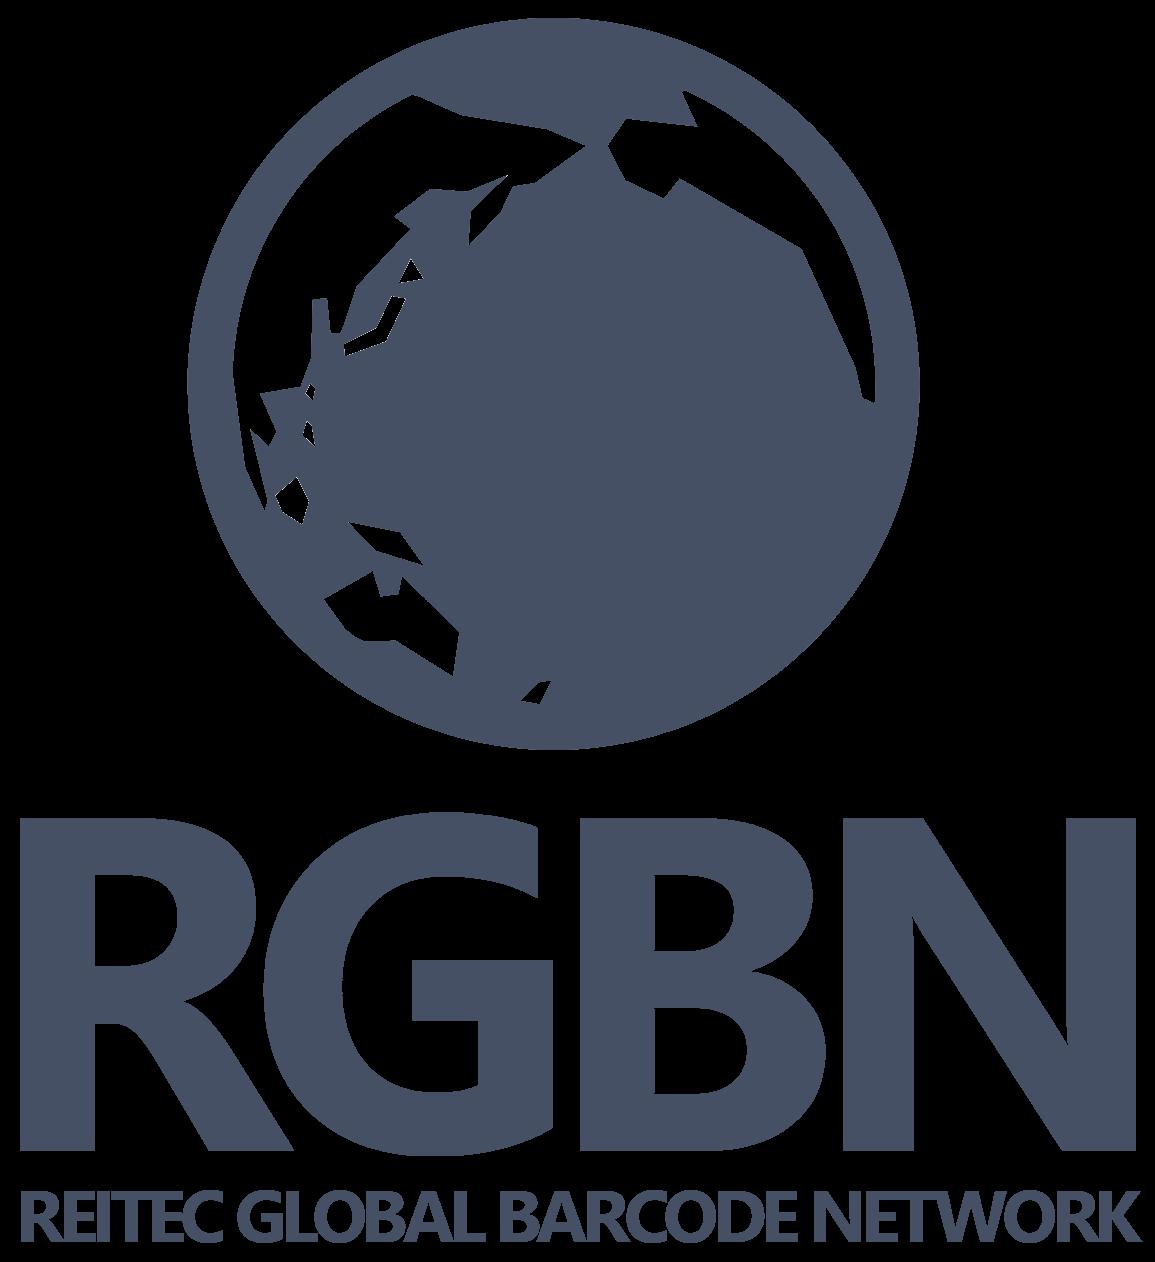 Reitec Global Barcode Network